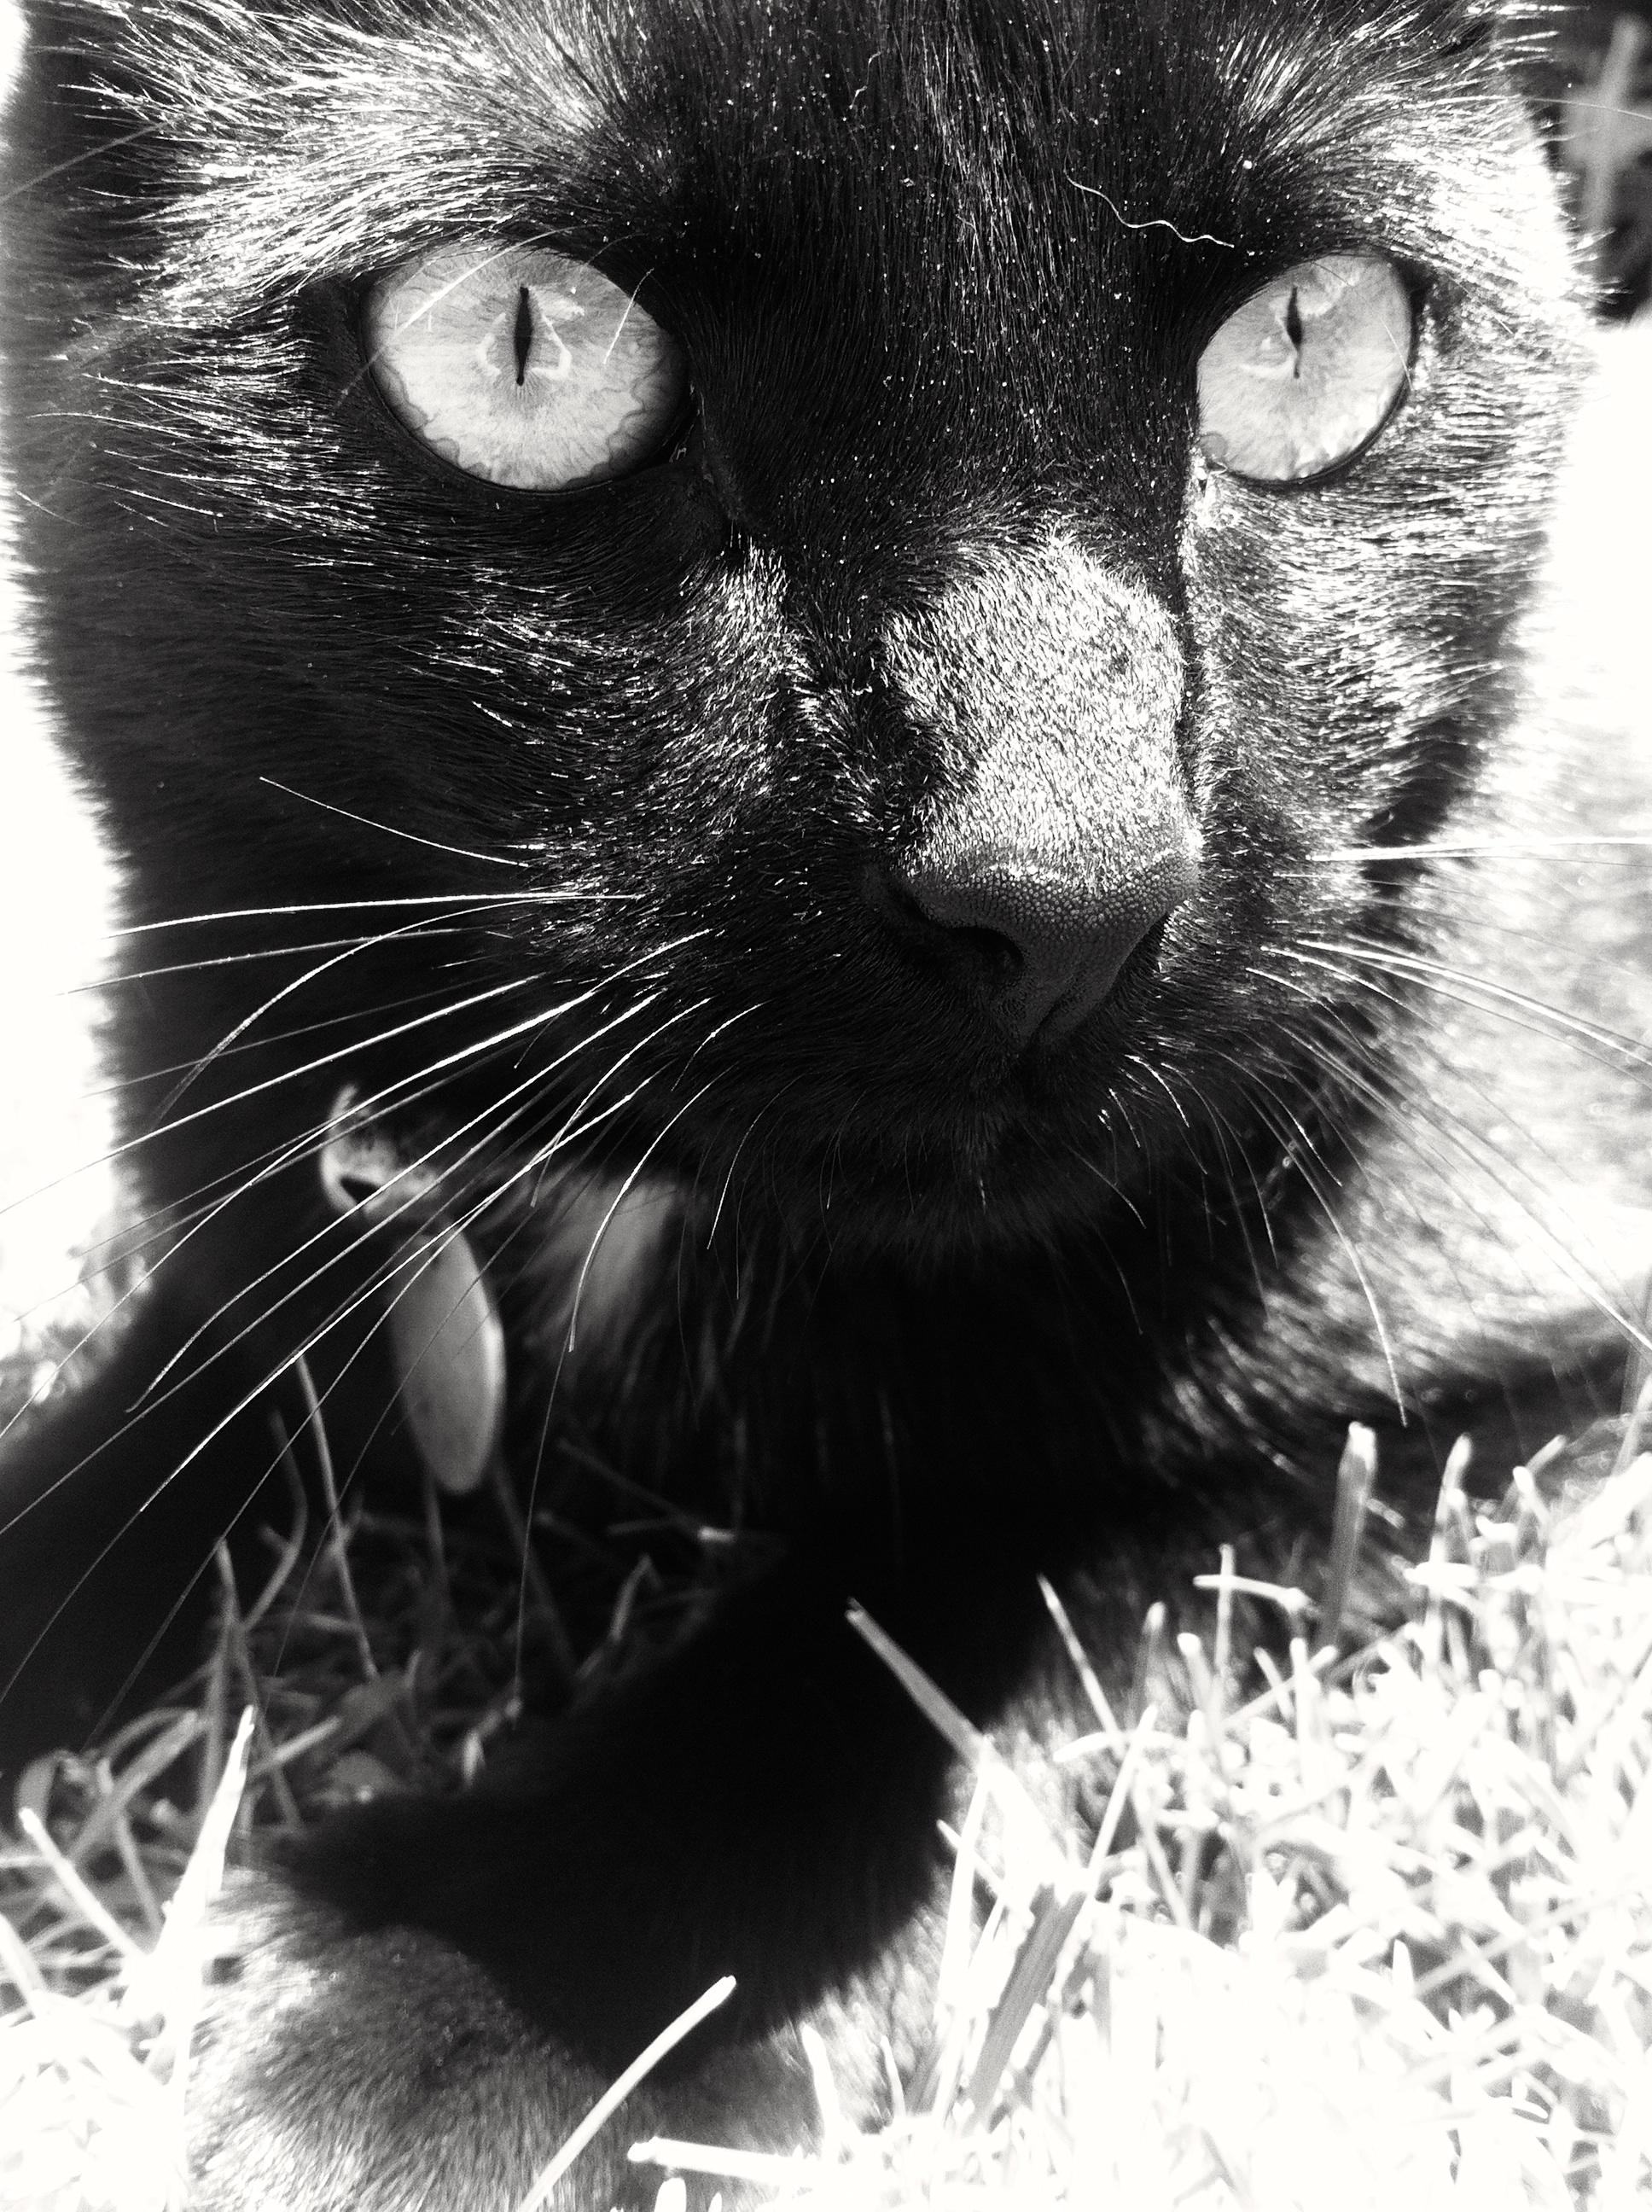 91 Gambar Binatang Kucing Hitam Putih HD Terbaru